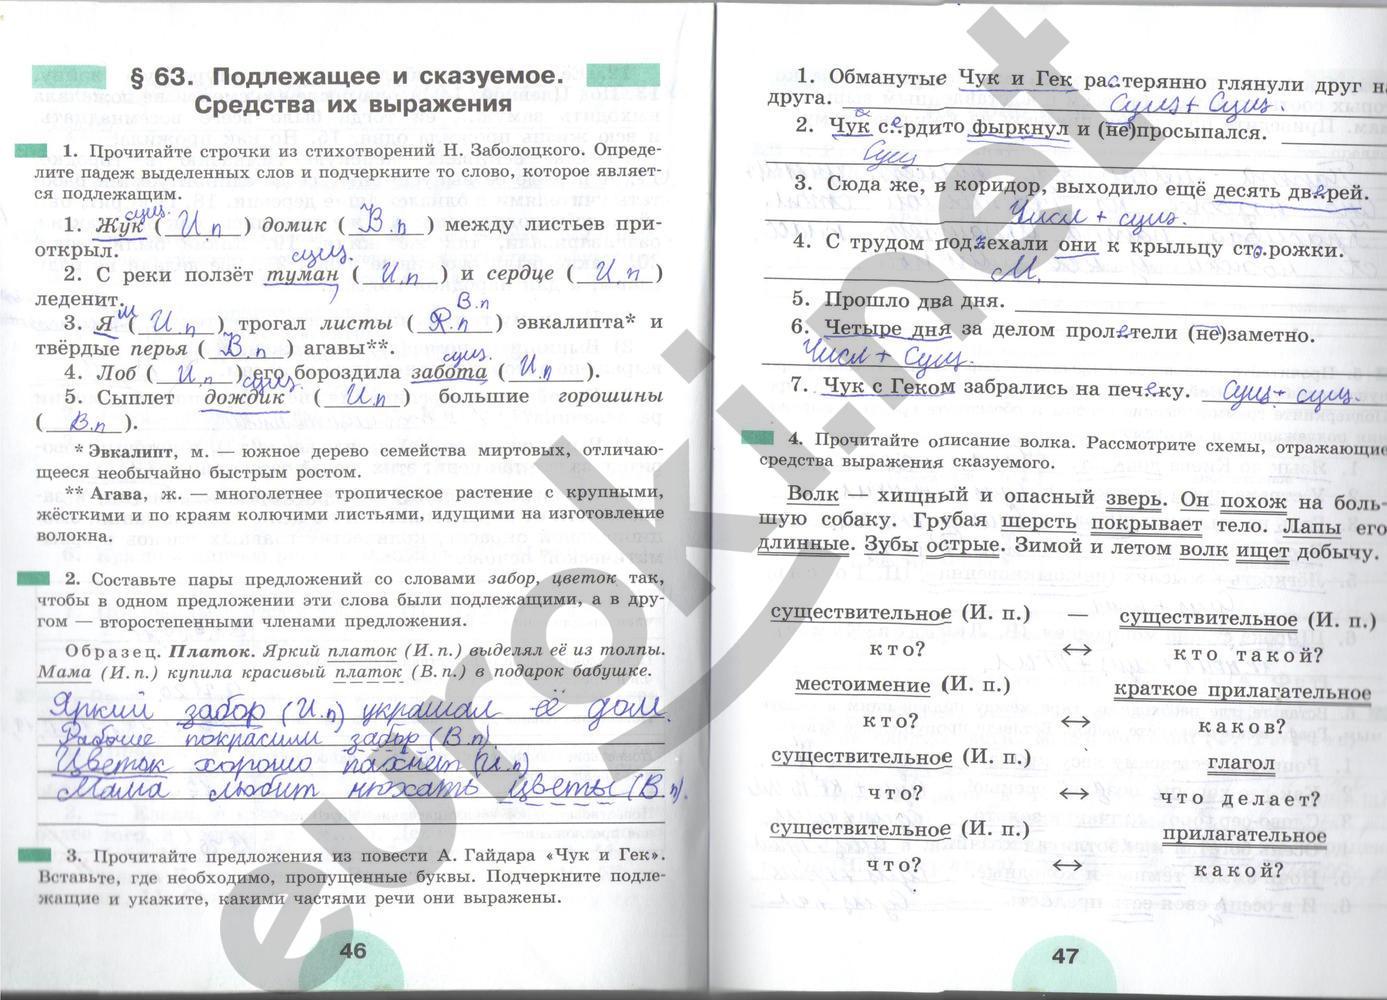 Гдз по русскому языку 5 класс рыбченкова 2 часть рабочая тетрадь 2018